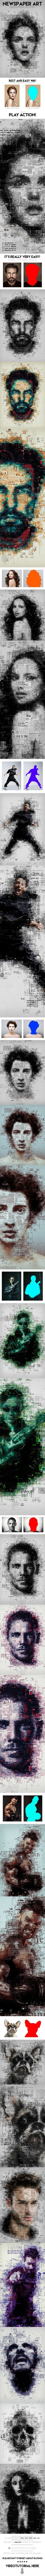 Newspaper Art Photoshop Action #photoeffect Download: http://graphicriver.net/item/newspaper-art-photoshop-action-/14103713?ref=ksioks